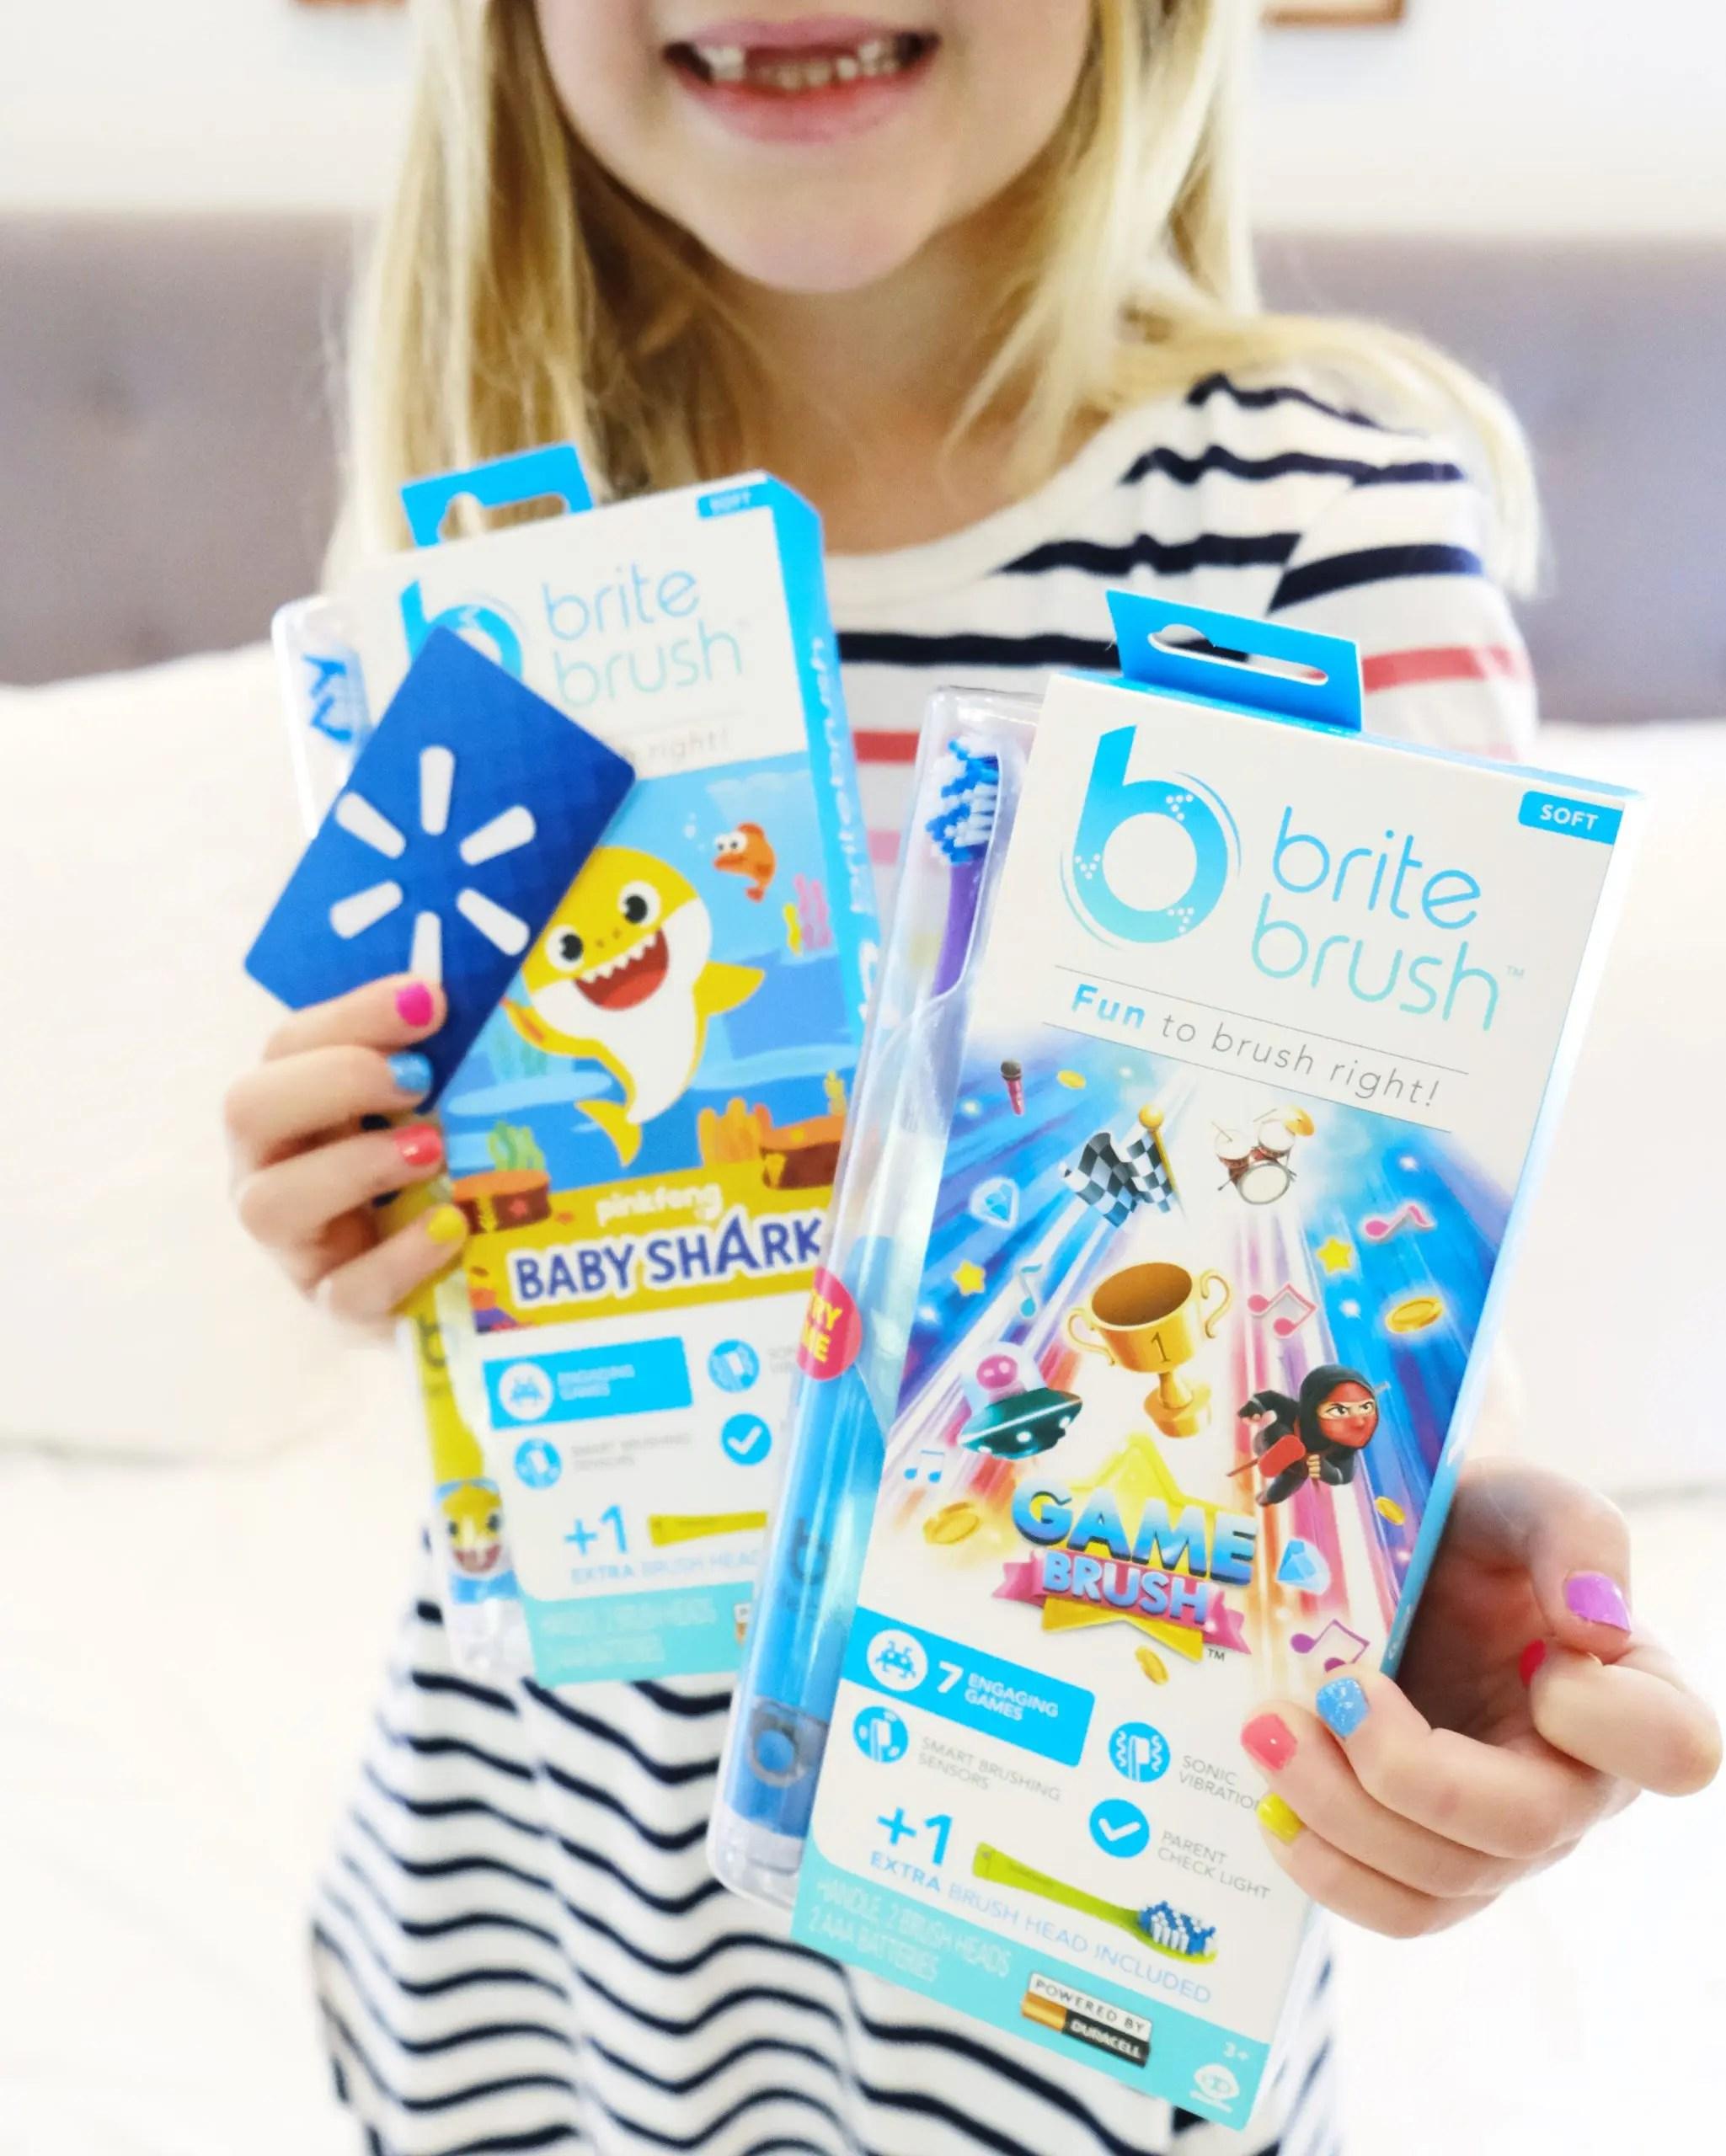 britebrush kids toothbrush - baby shark toothbrush at walmart instagram giveaway